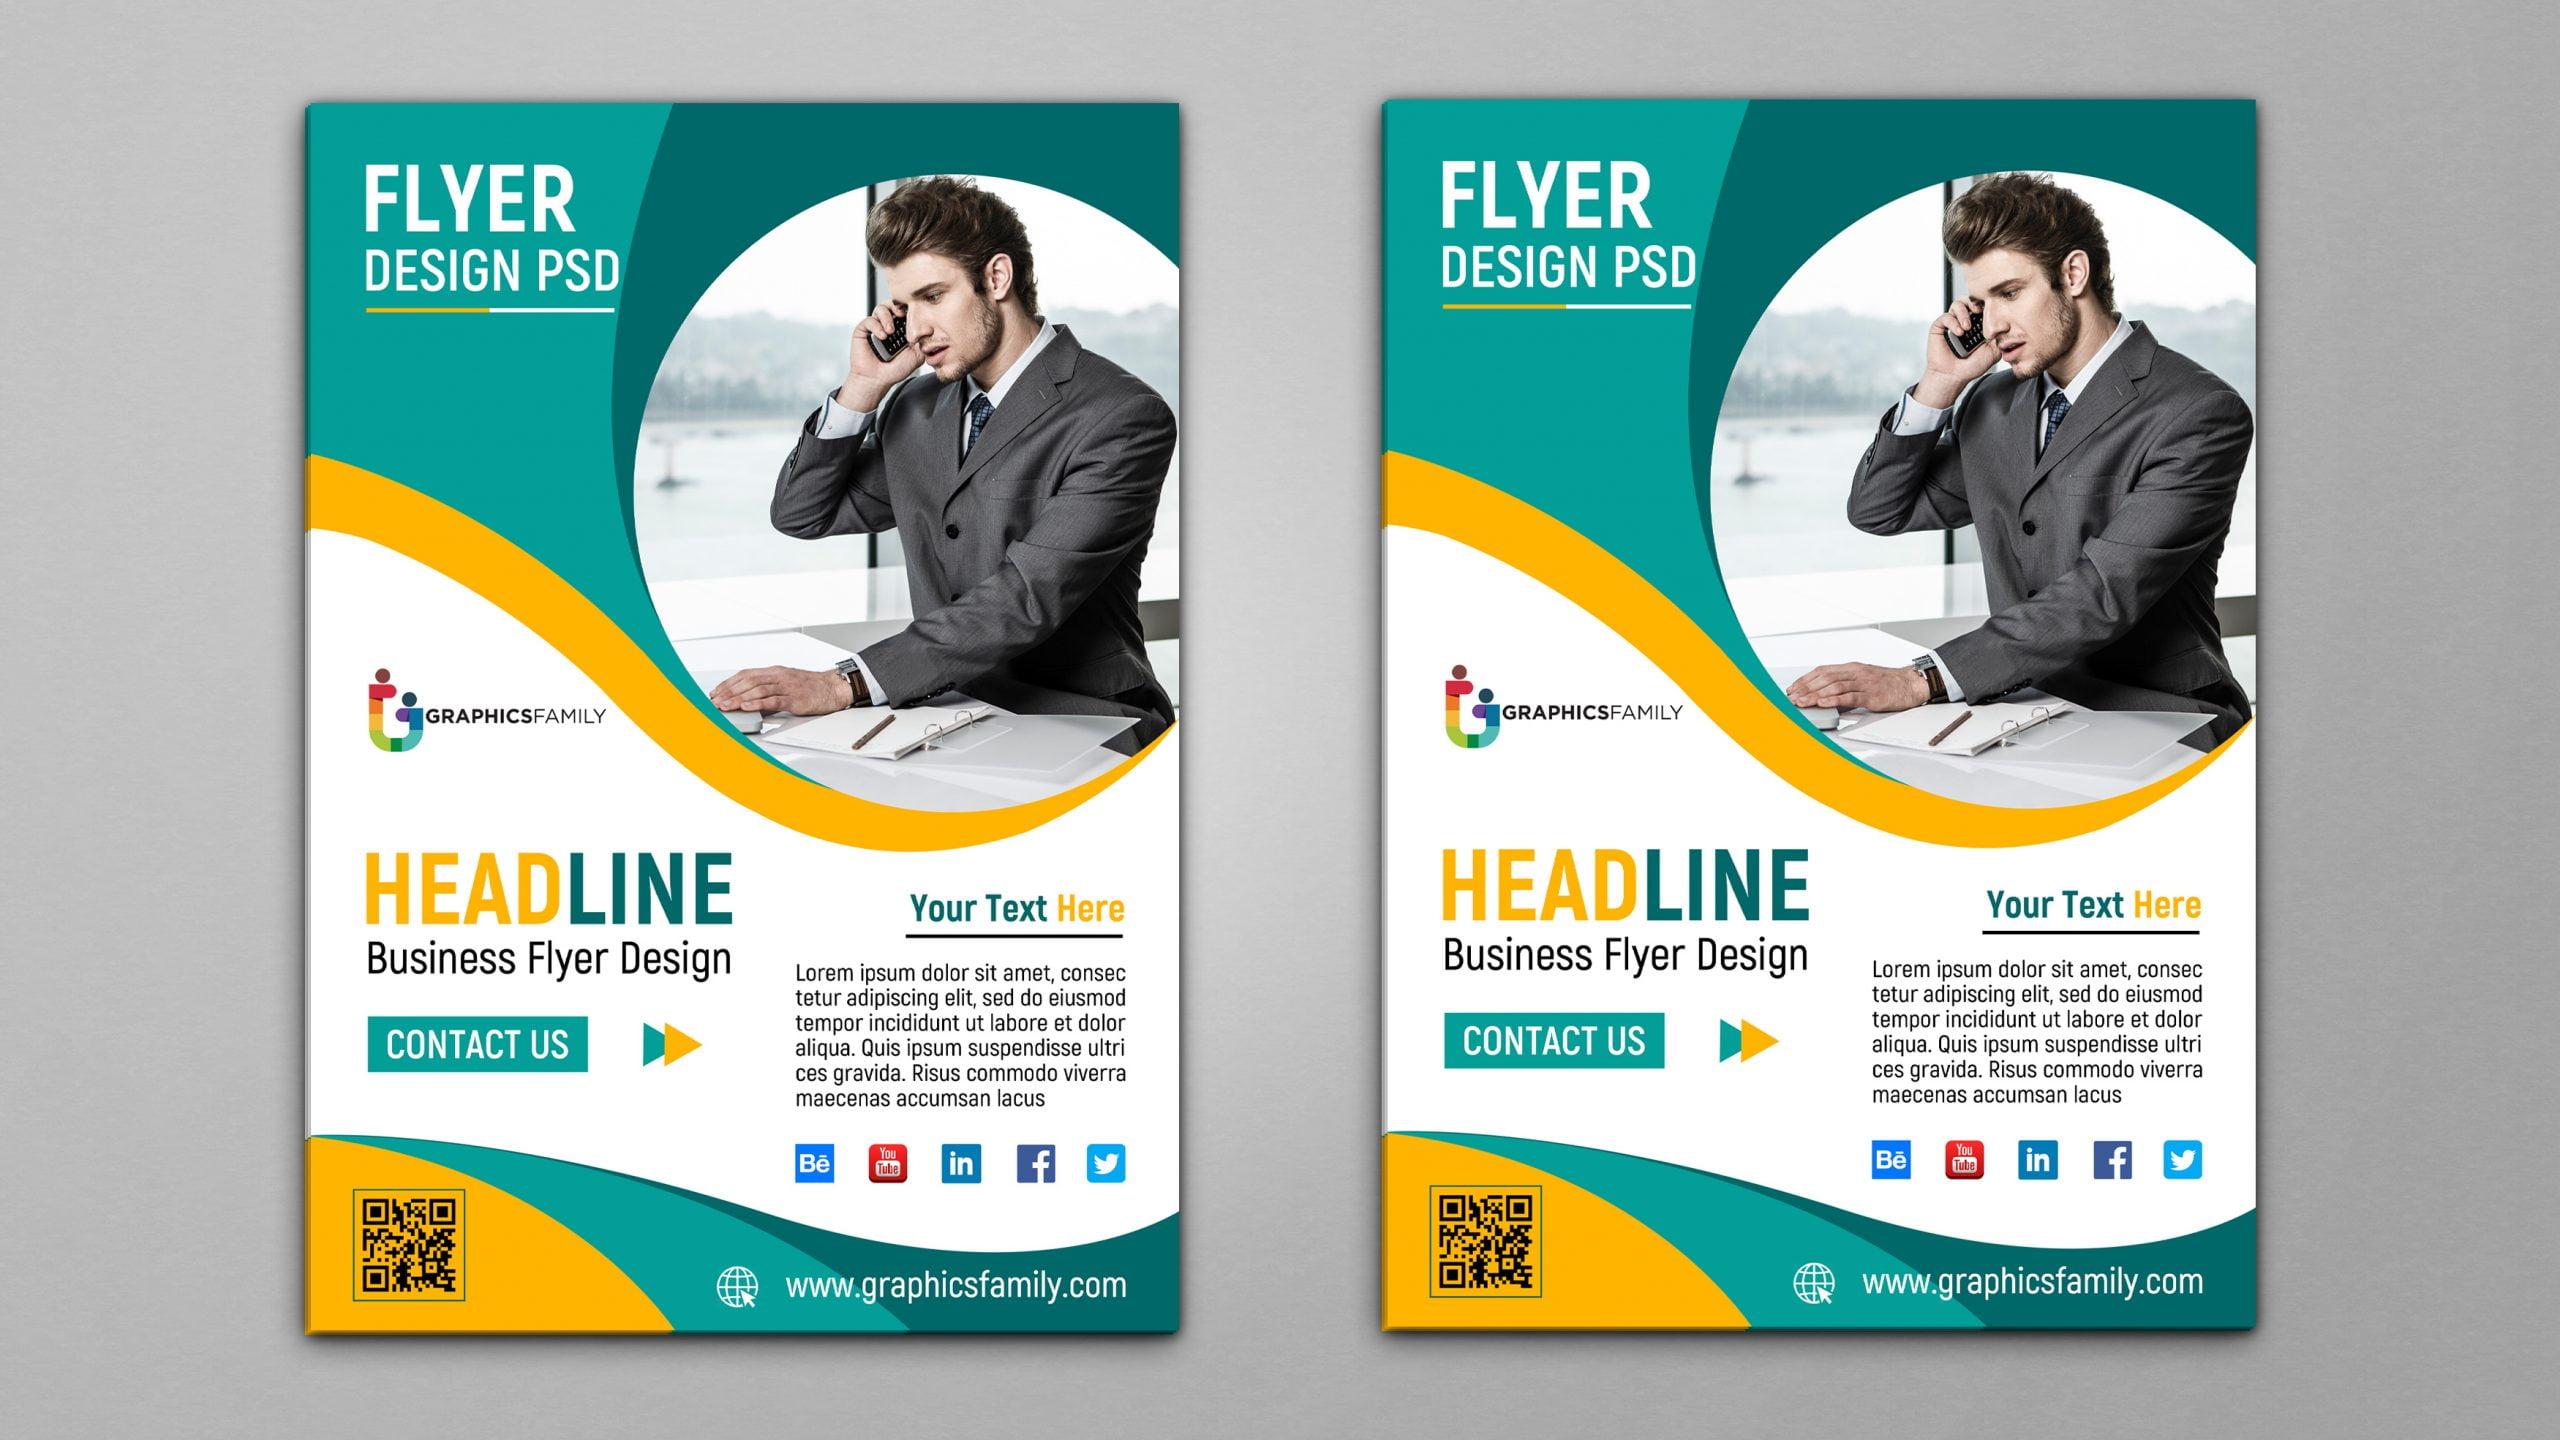 Free Business Flyer Template Design PSD